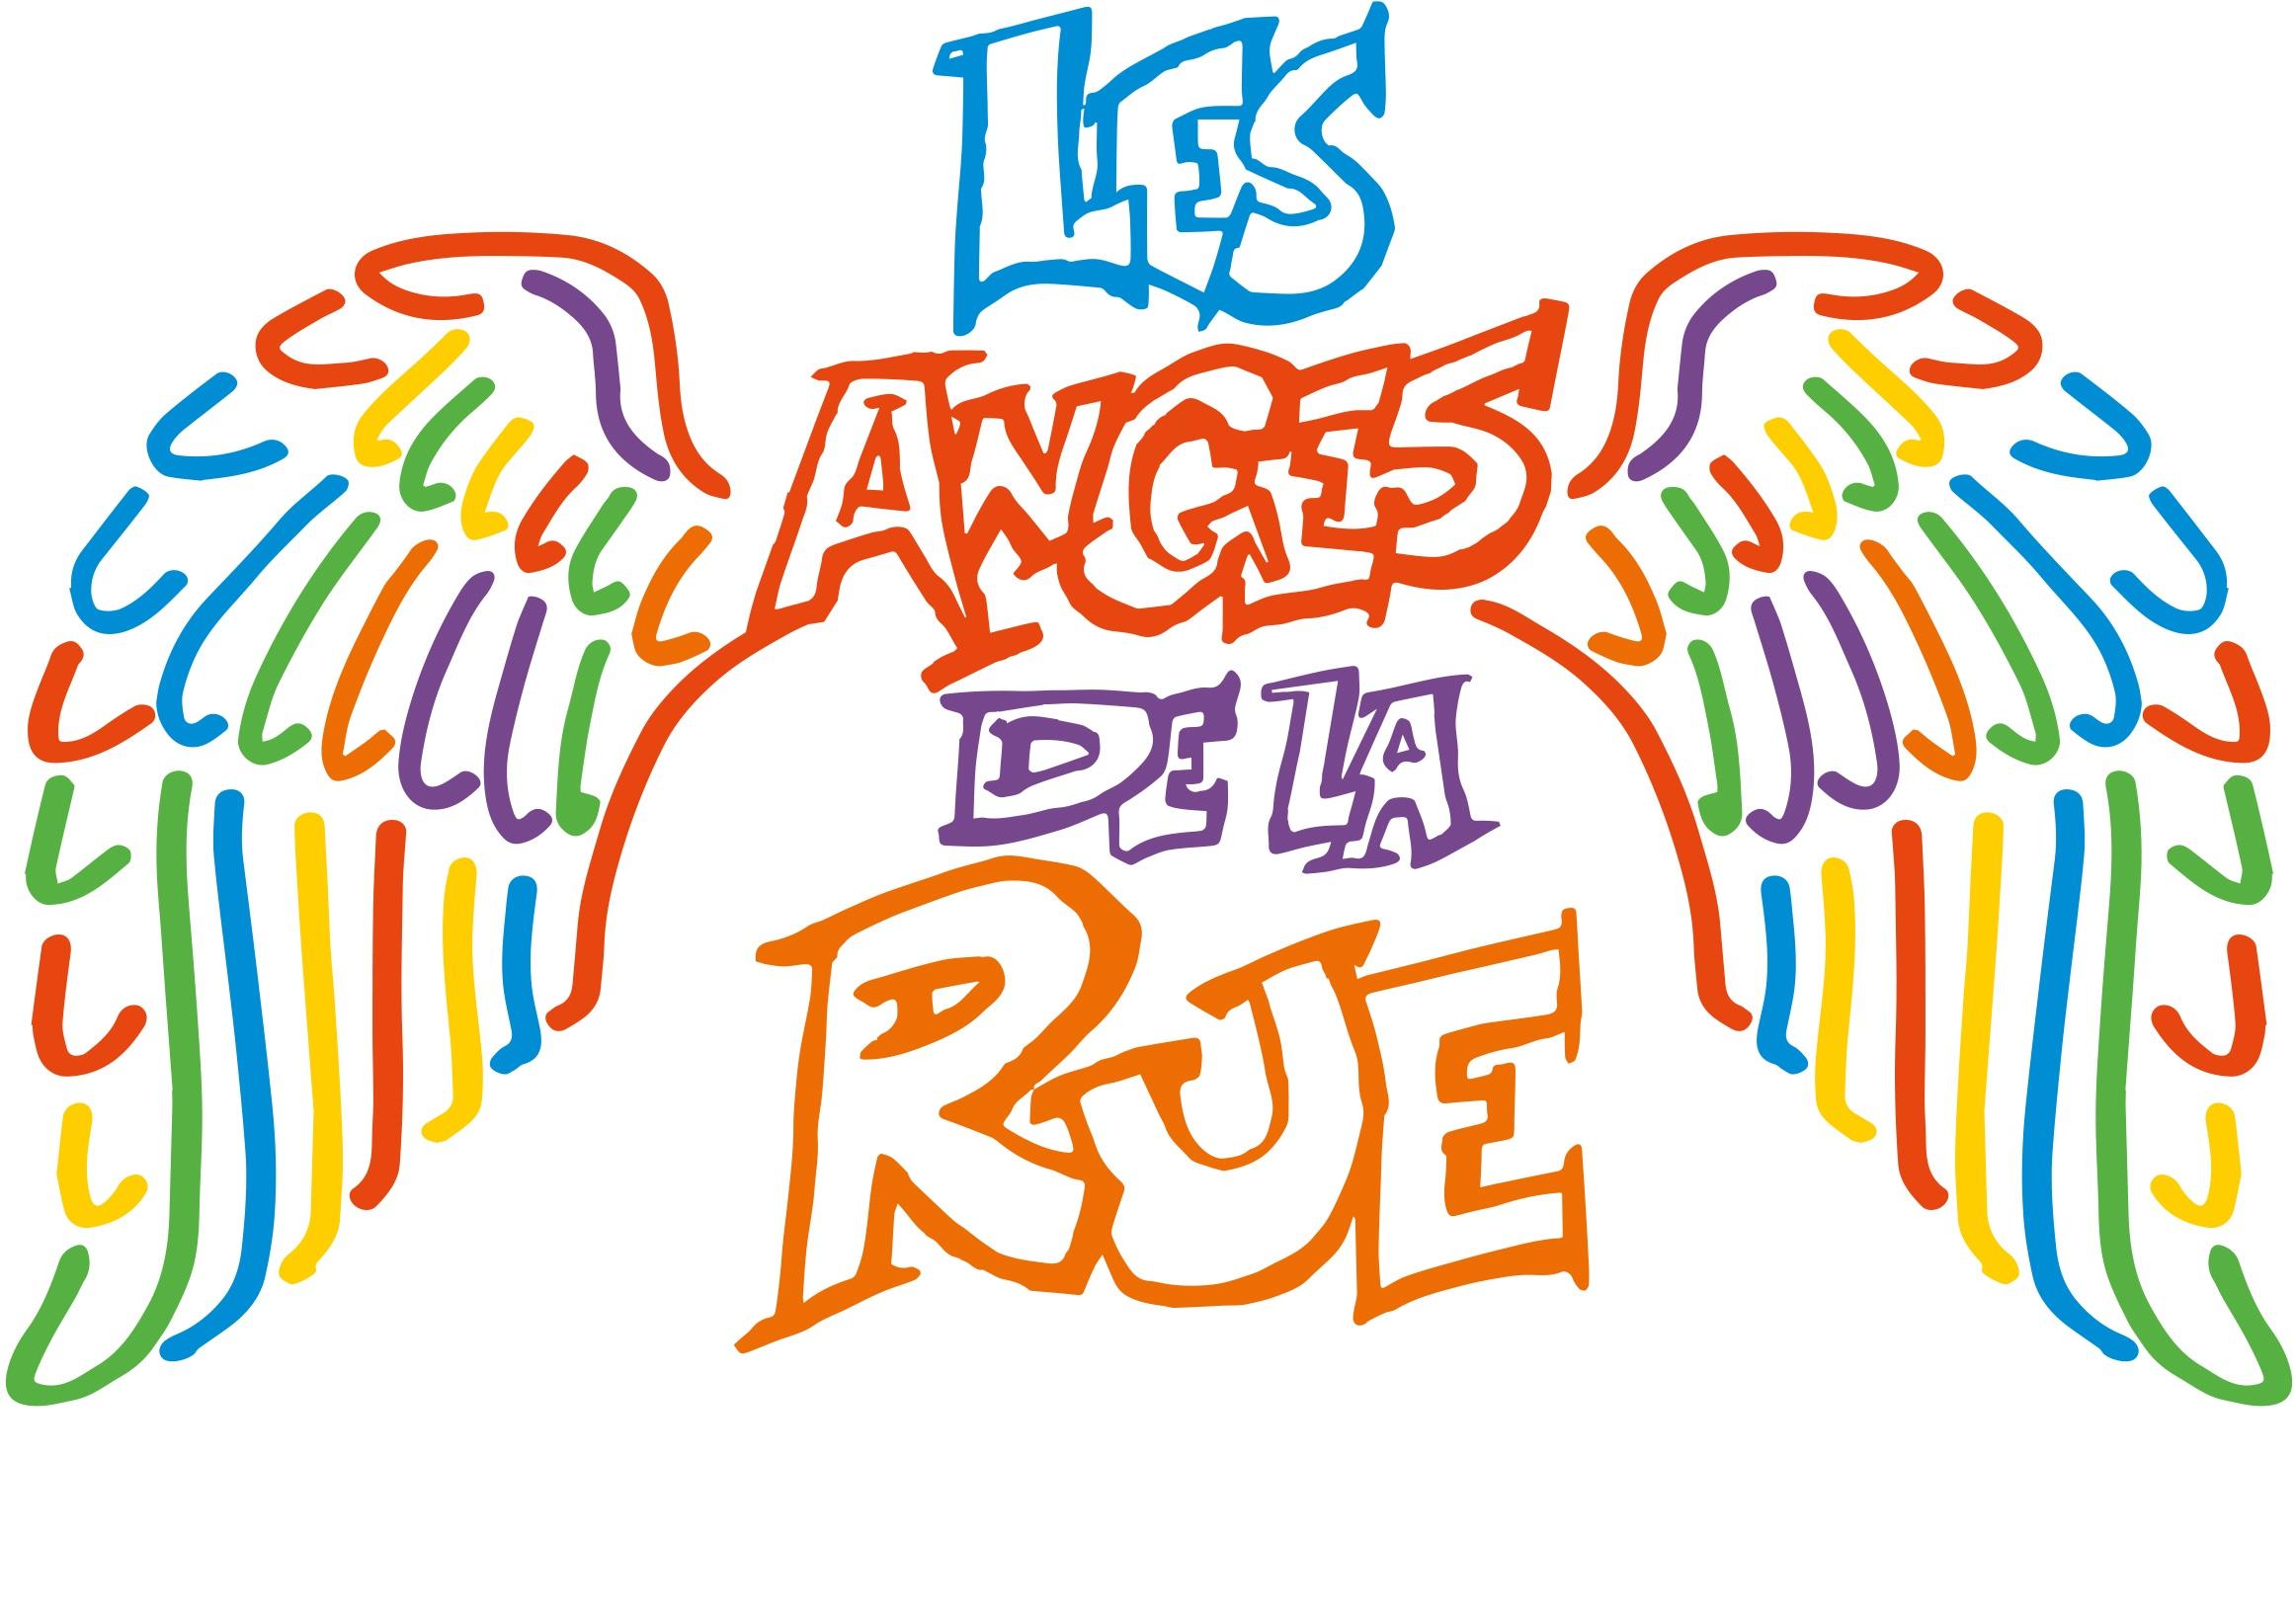 ASSOCIATION LES ANGES DE LA RUE